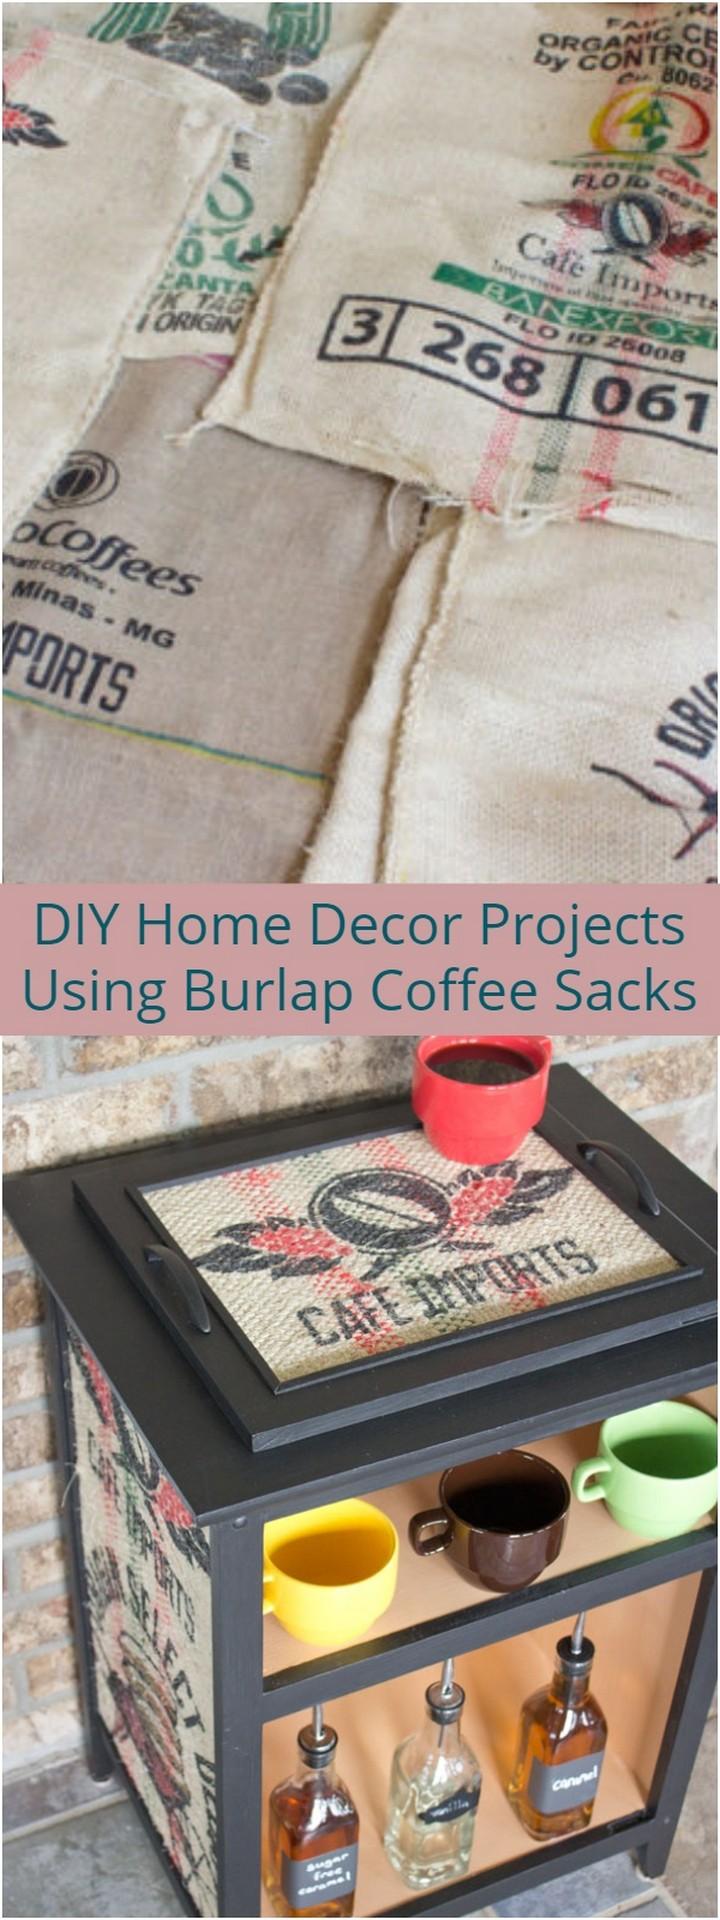 DIY Home Decor Projects Using Burlap Coffee Sacks 1